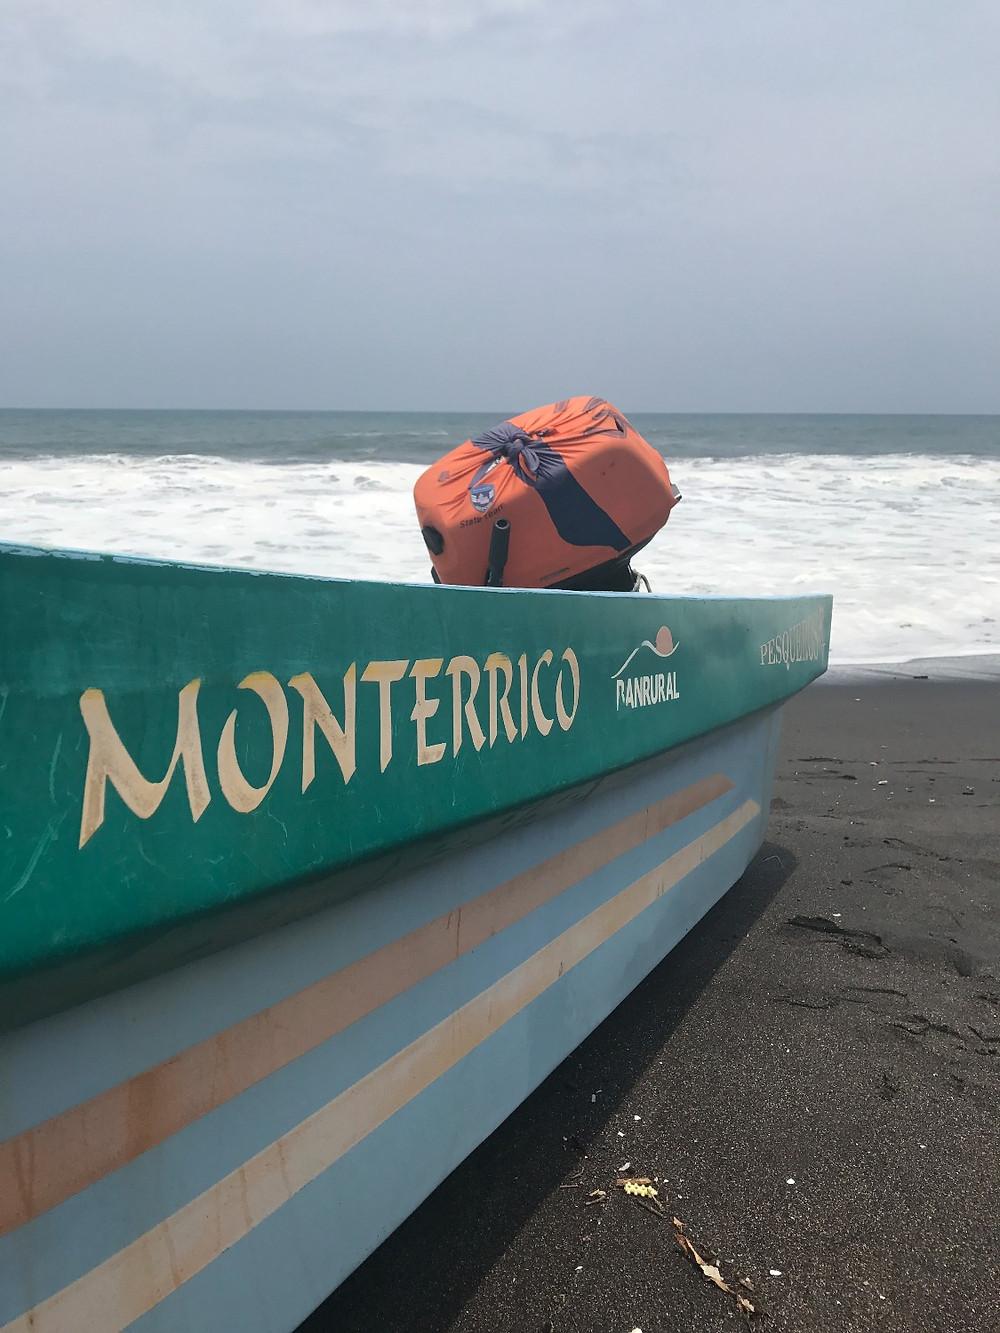 The black sands of Monterrico